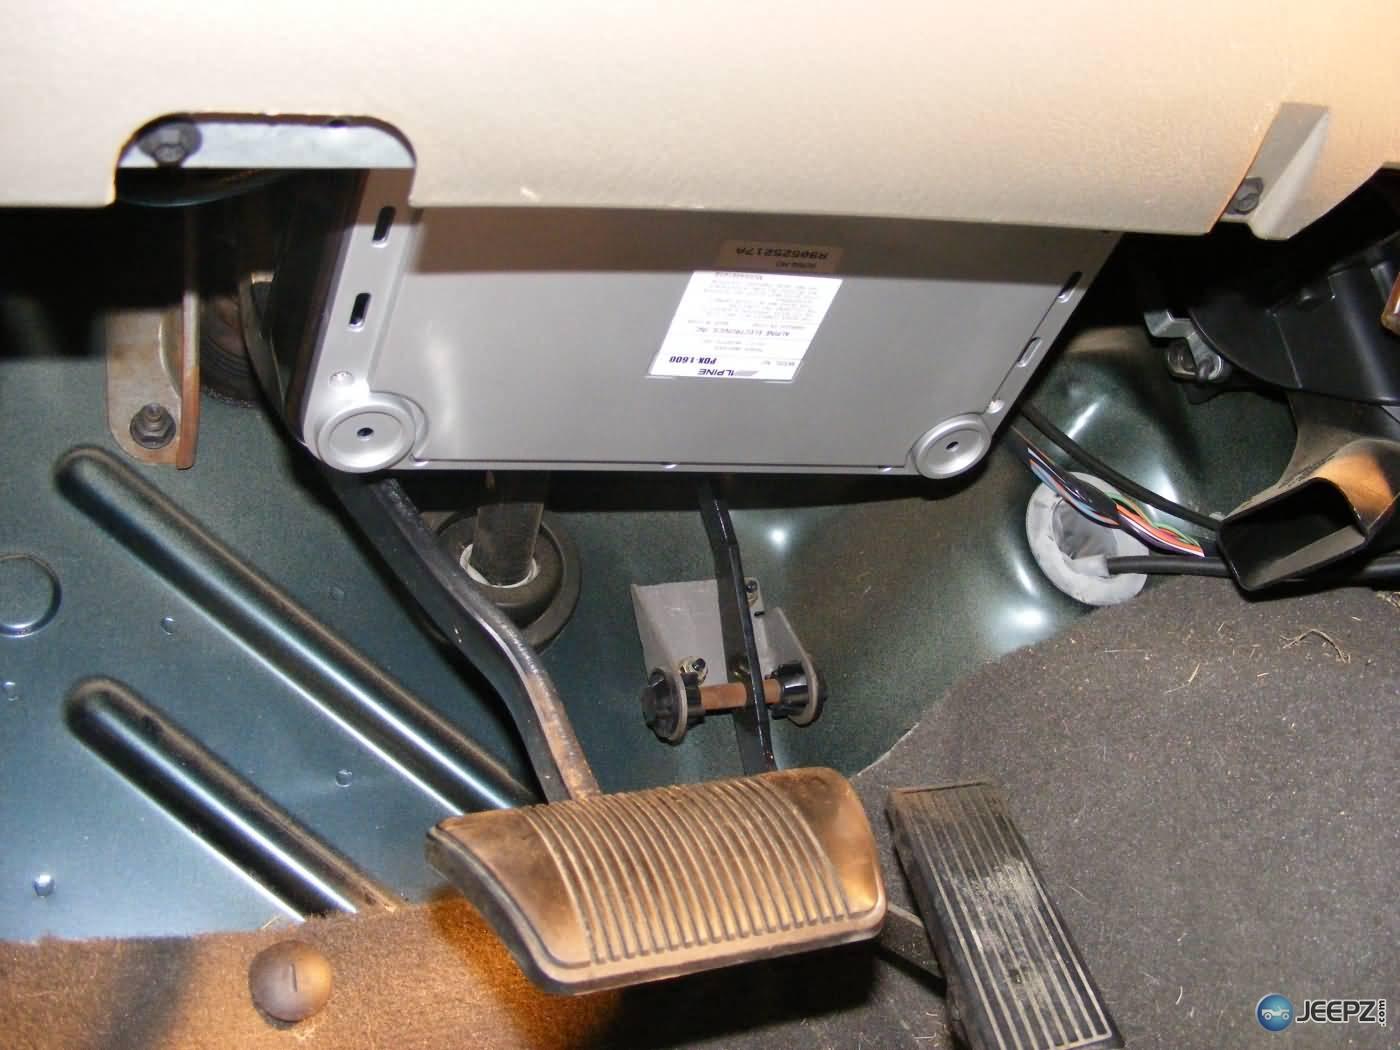 hight resolution of skinny pedal jeep tj amp bracket amp mount jeep wrangler tj